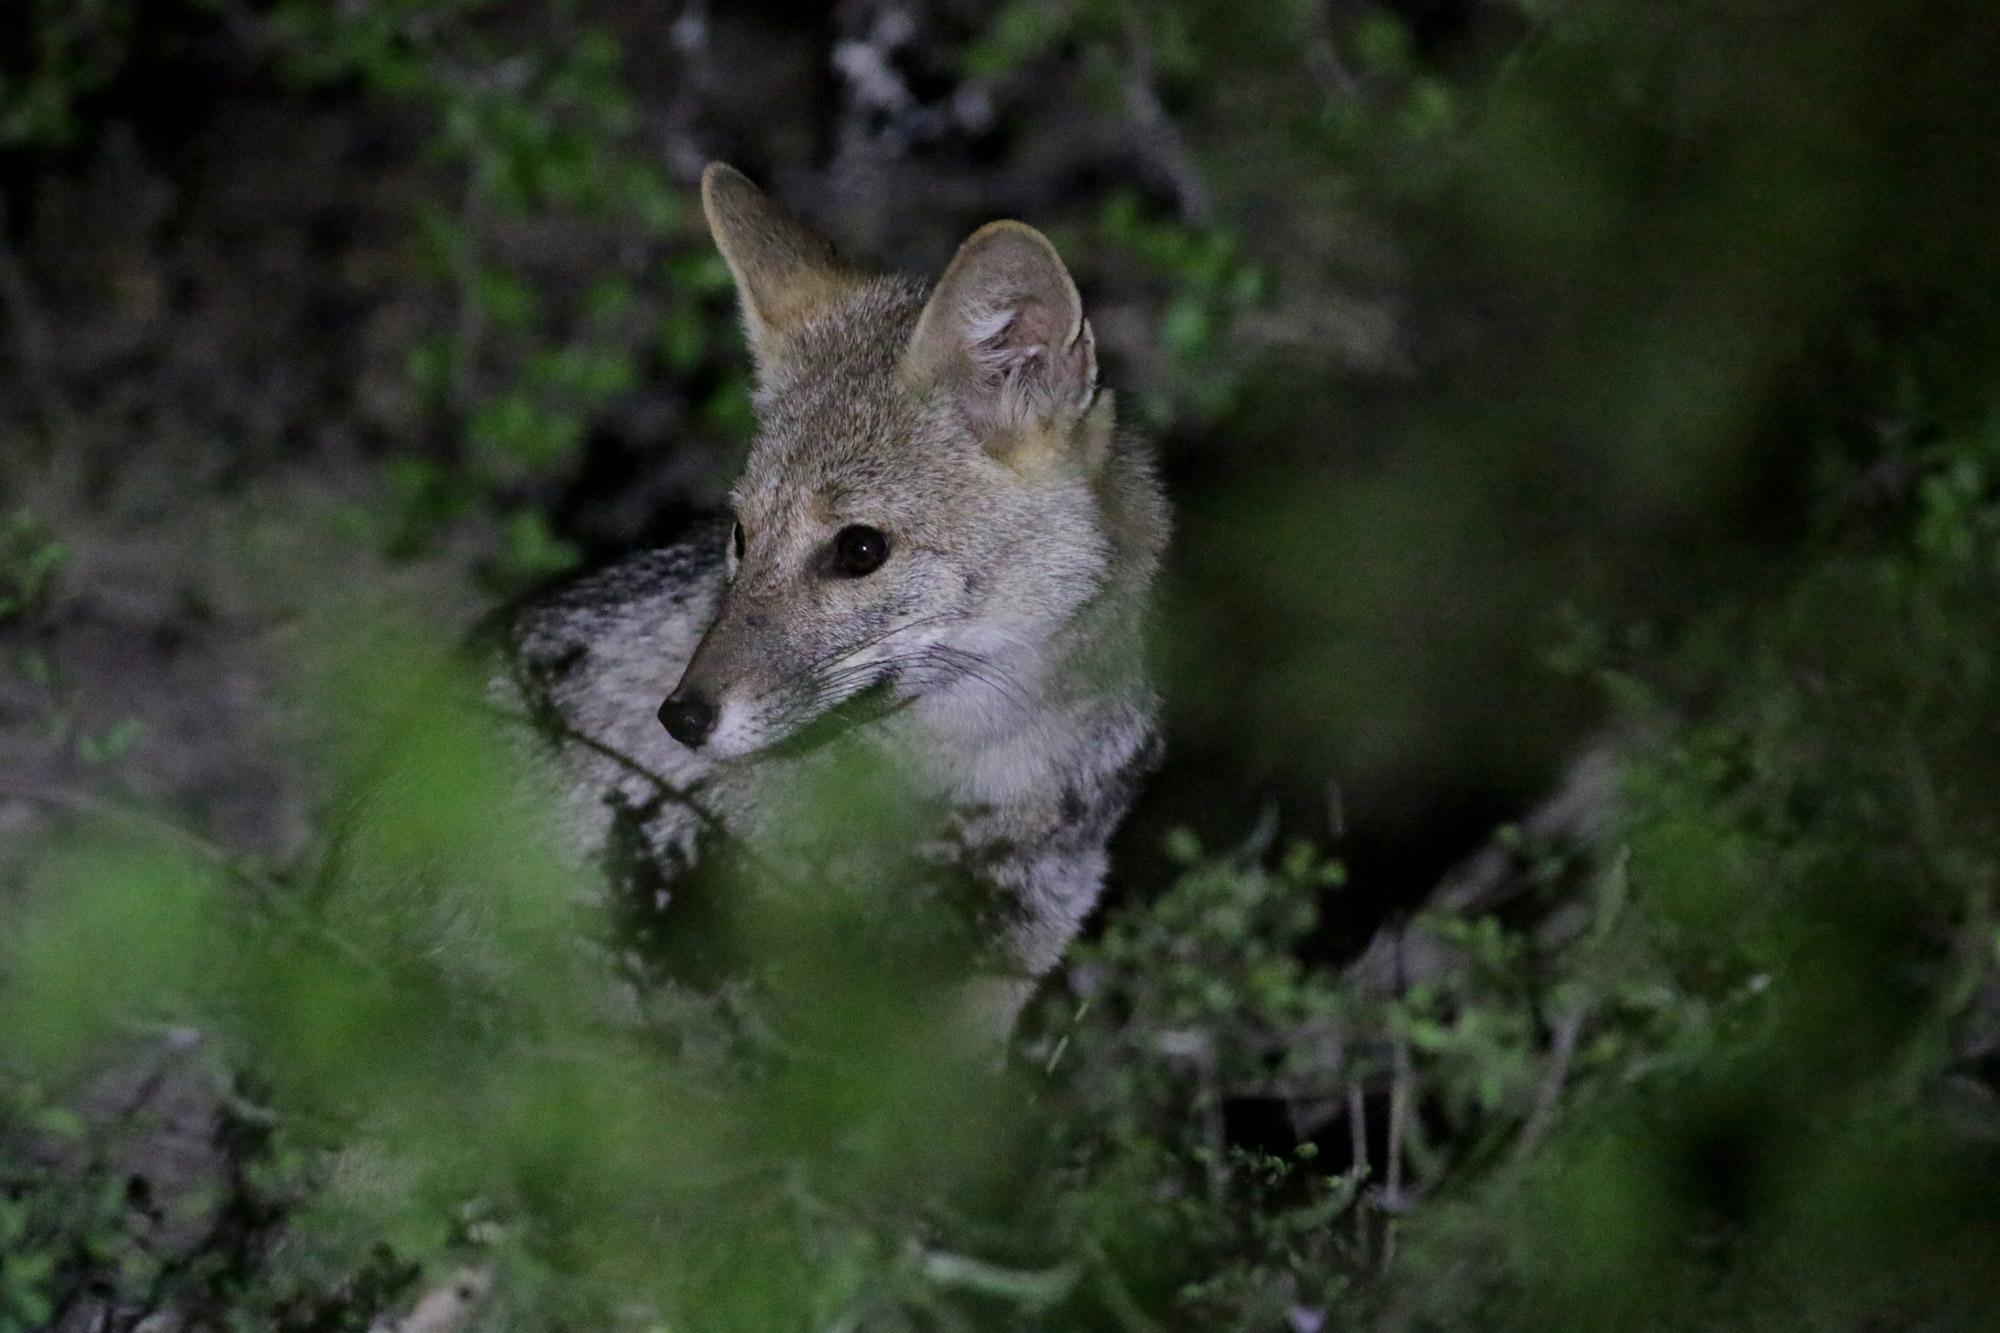 Bolivia 2016 - Dag 6 - Een vosje in het Parque Nacional Gran Chaco del Kaa-Iya